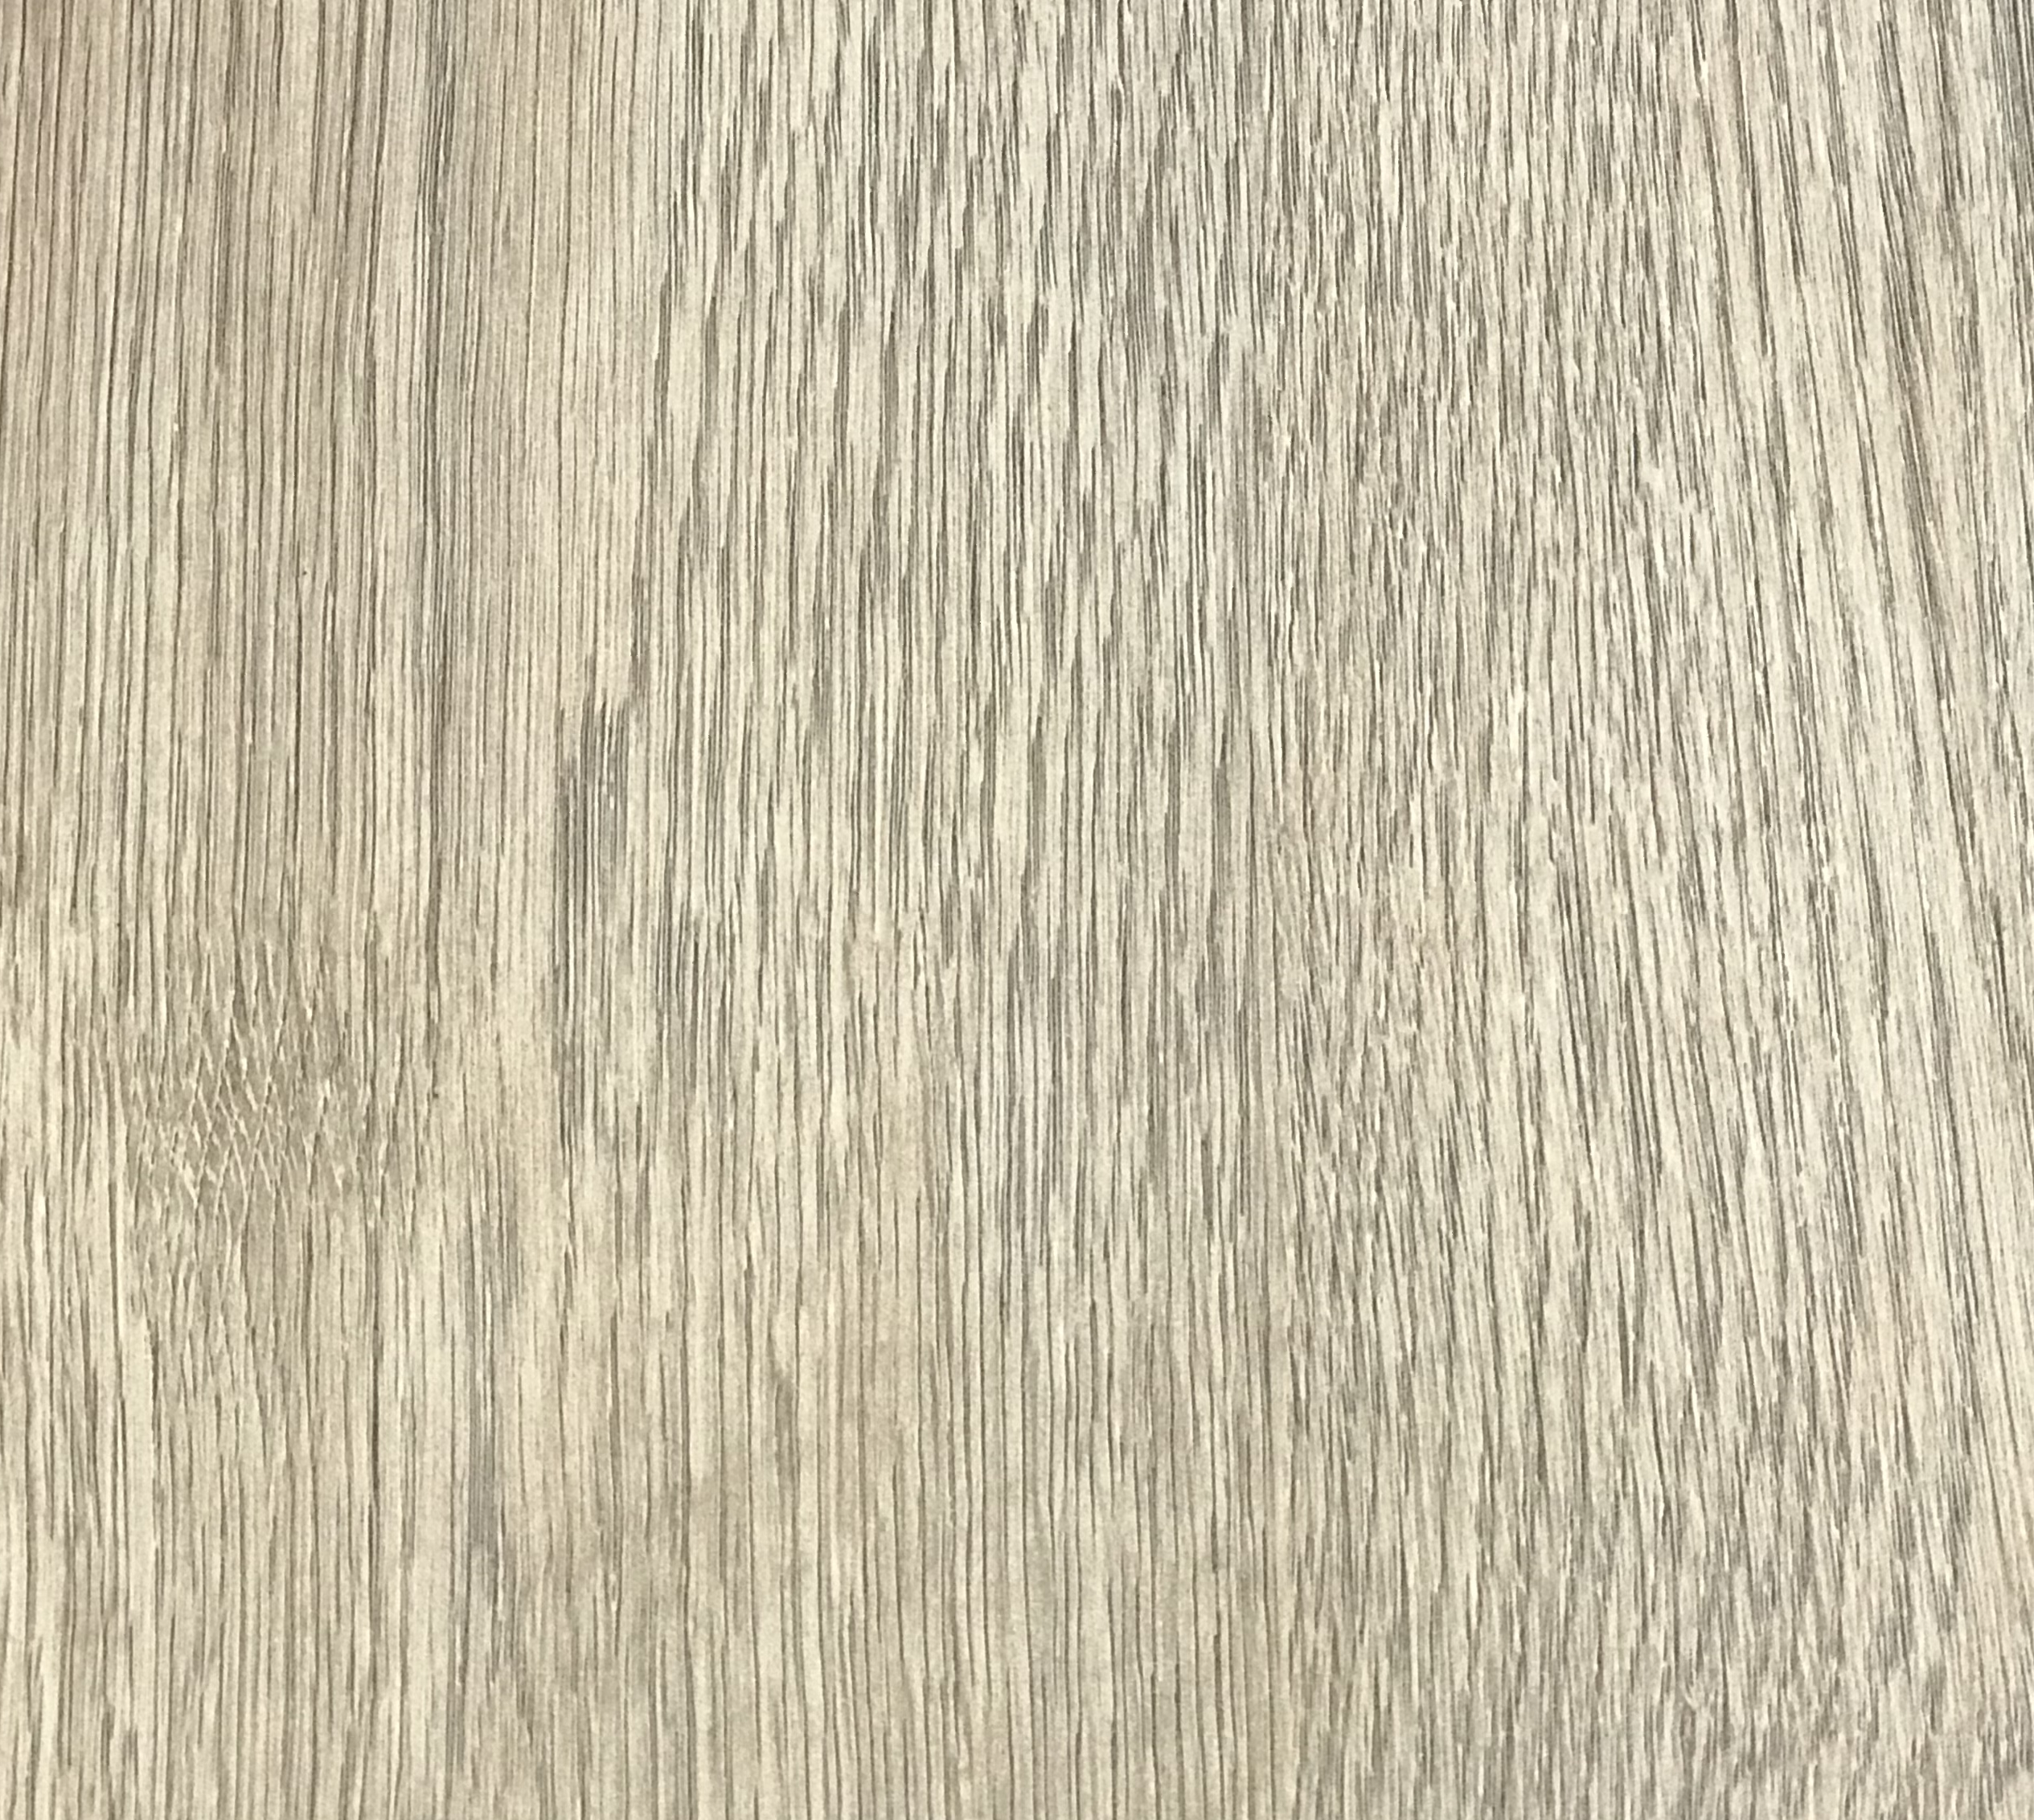 Crafted Oak